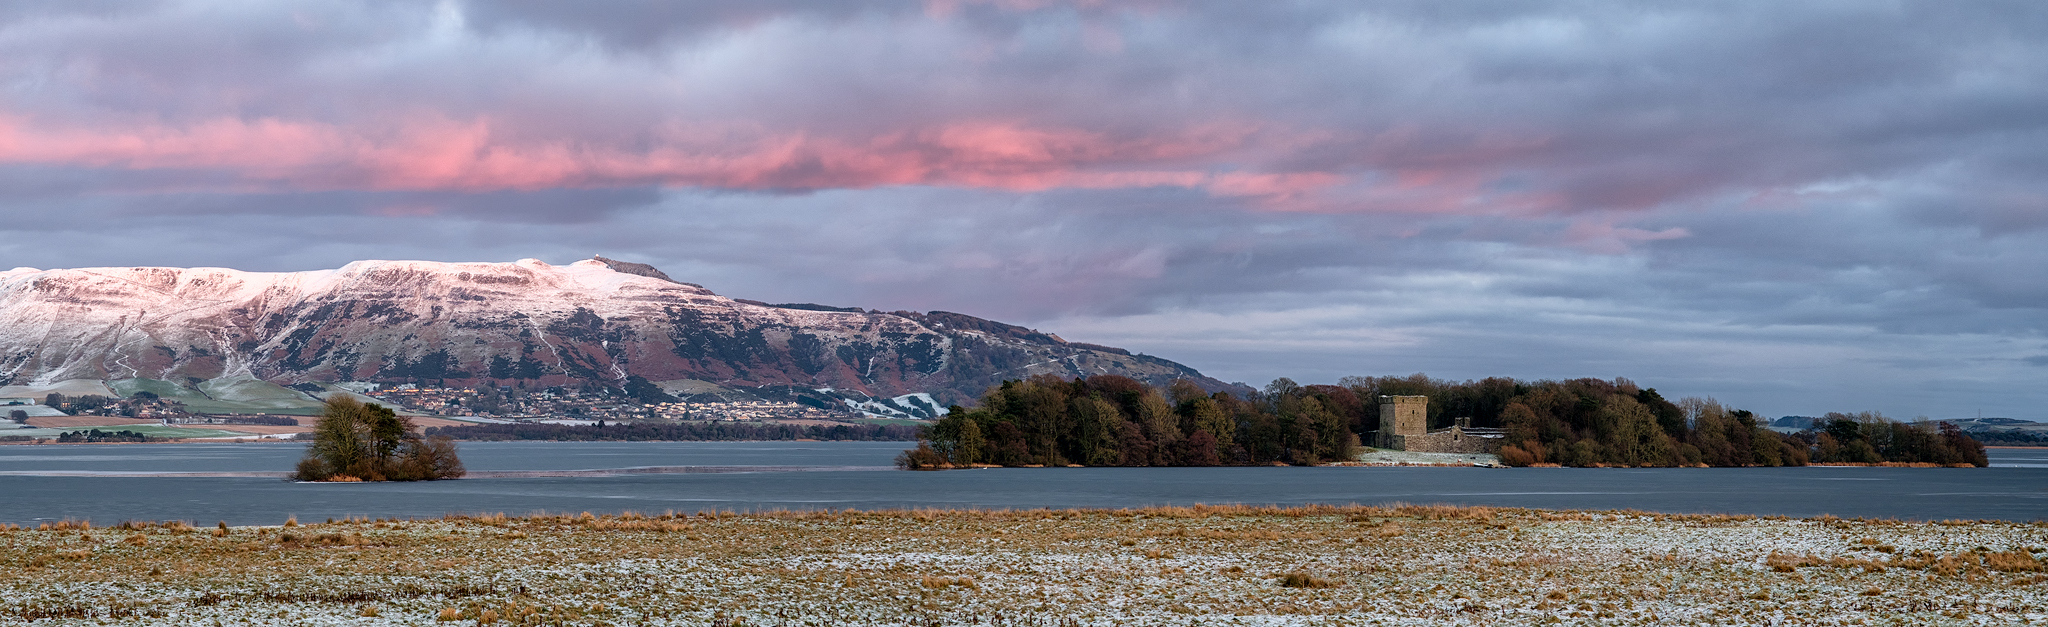 Bishops Hill & Loch Leven Castle #01